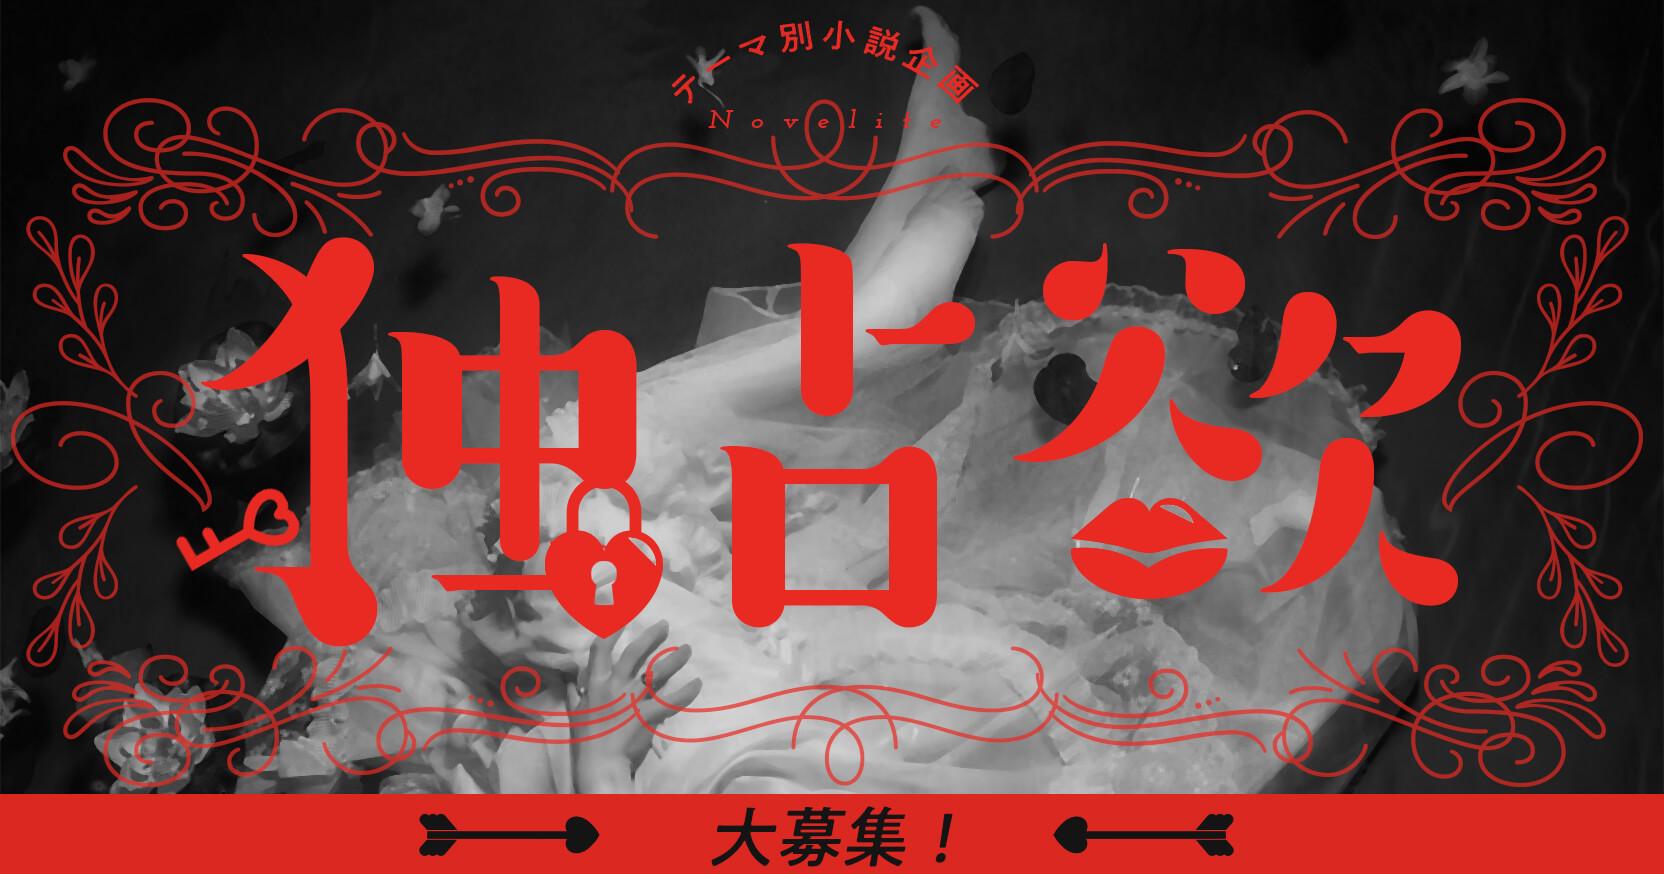 https://storage.googleapis.com/blog-info/entry/2021/04/20210406-novelite_dokusenyoku.jpg